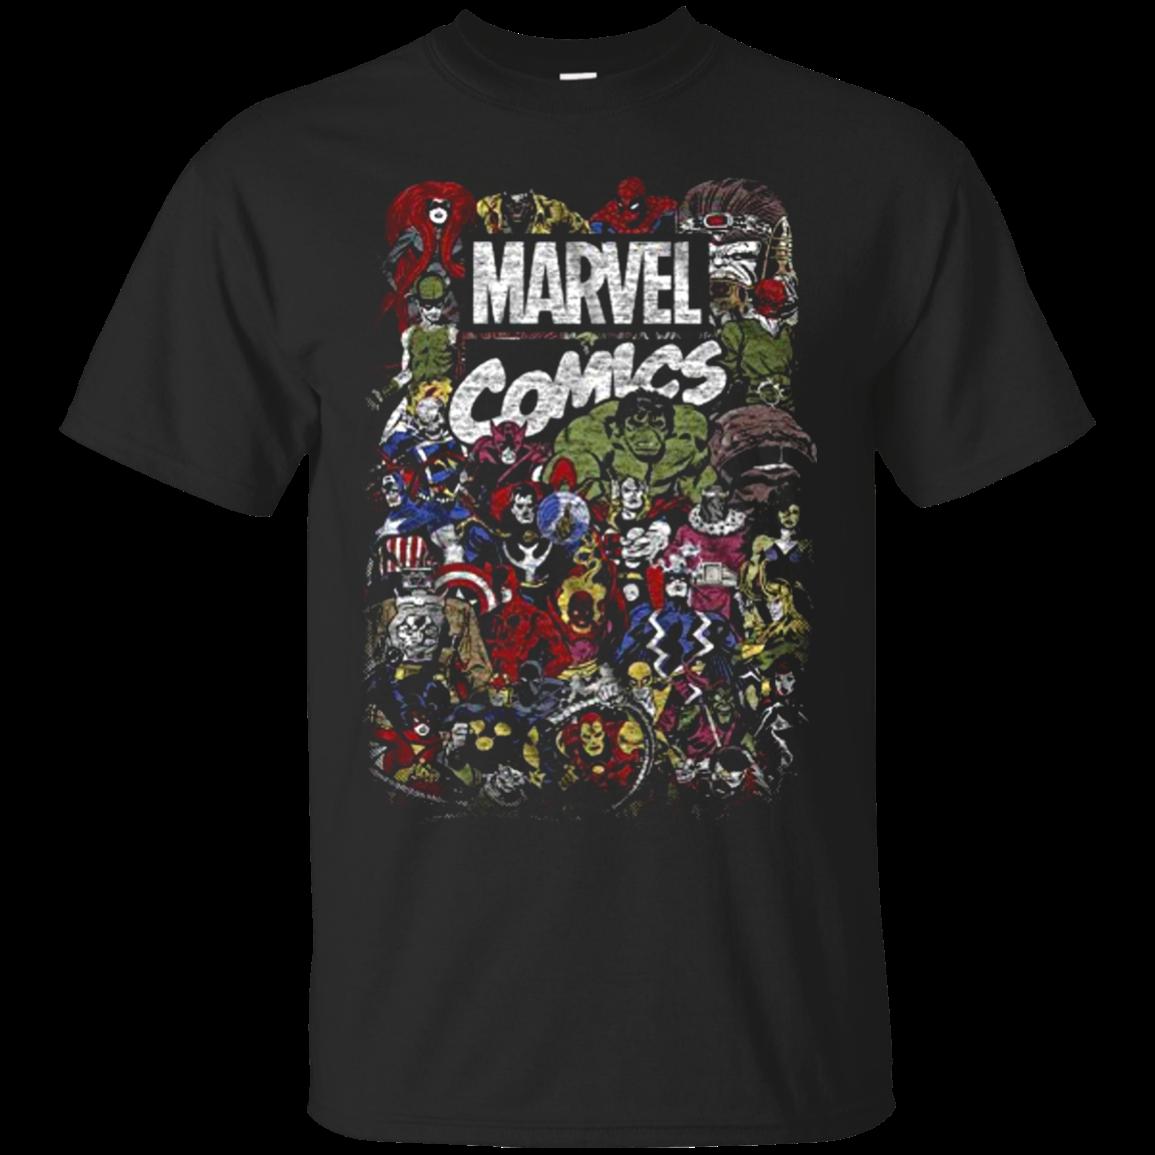 Comics Logo Thor Hulk Iron Man Avengers Spiderman Daredevil Strange Loki Thanos T shirt hoodie sweater Men